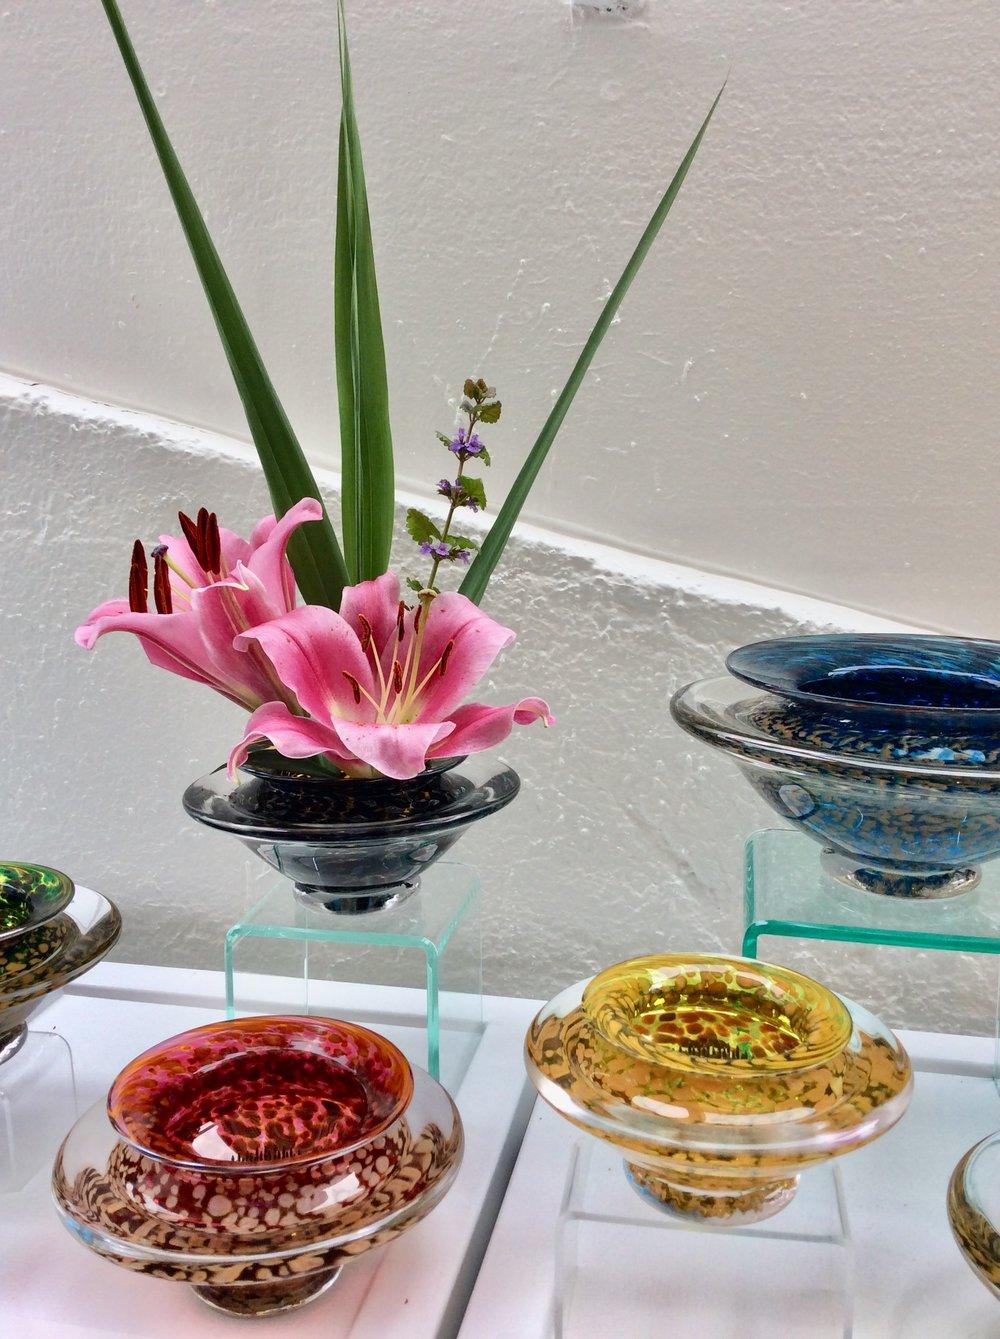 Ikebana by Danielle Blade at Rachel K DeLong Gallery